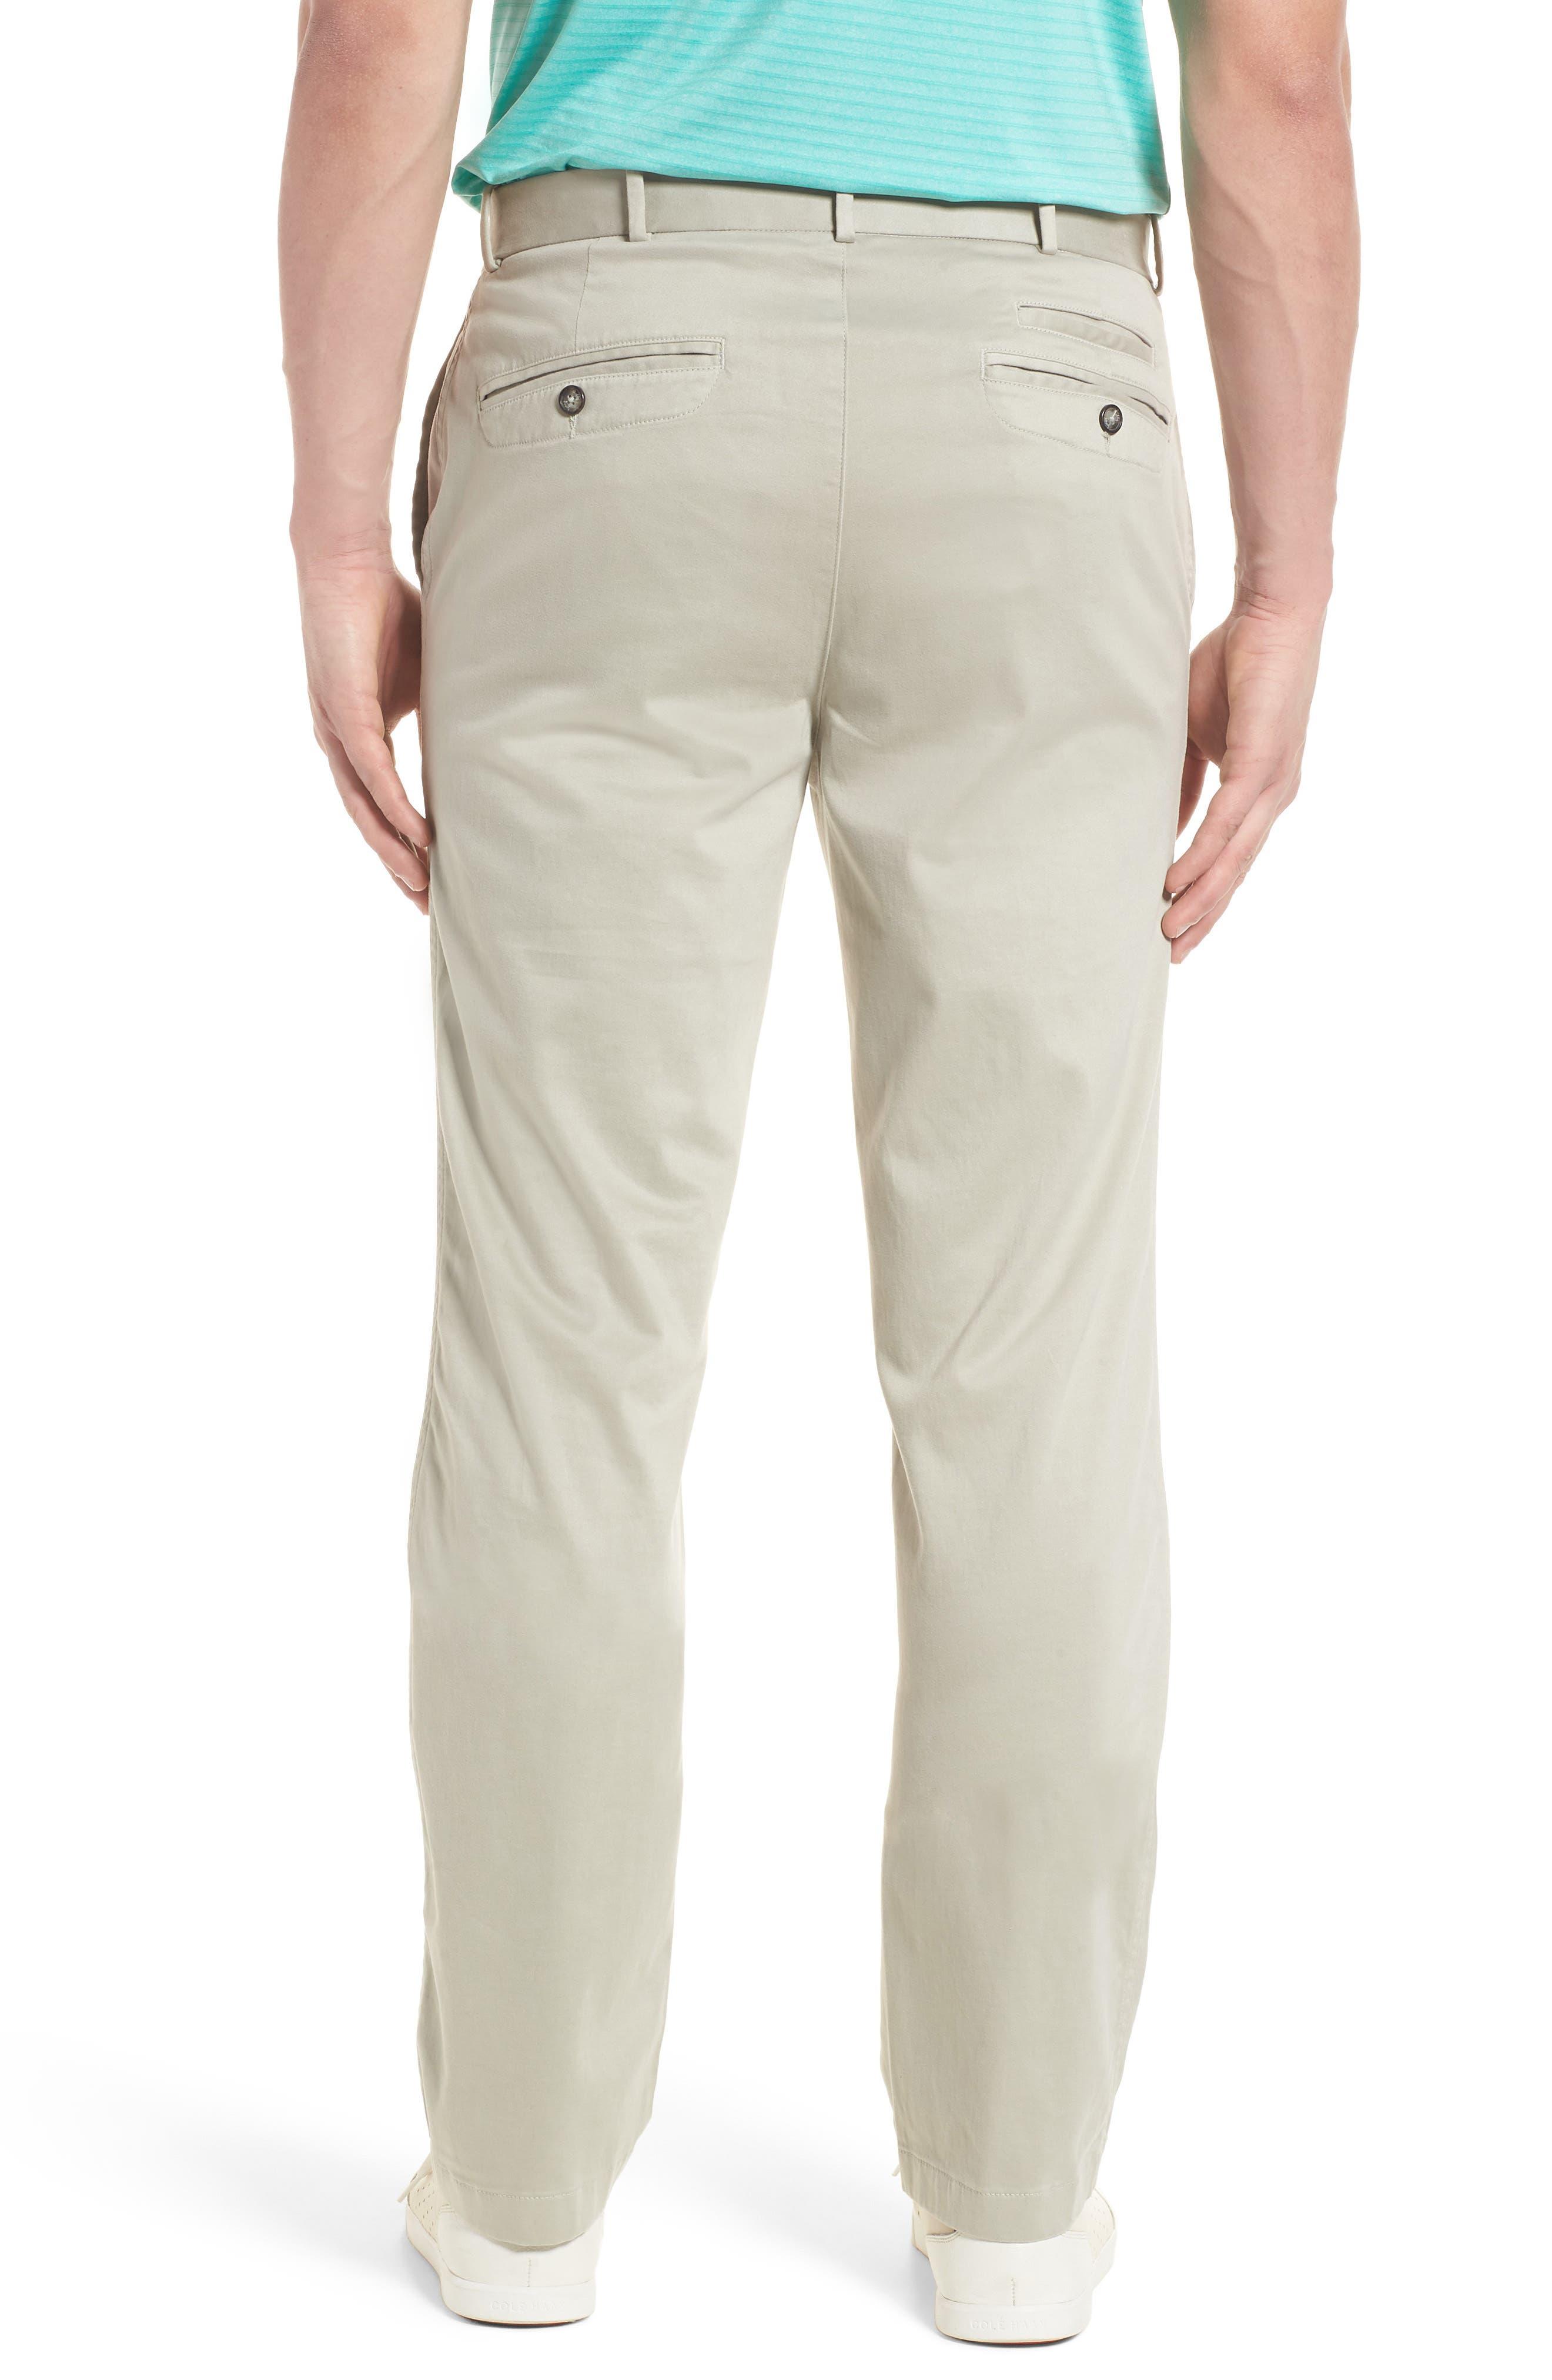 St. Charles Brushed Chino Pants,                             Alternate thumbnail 2, color,                             051